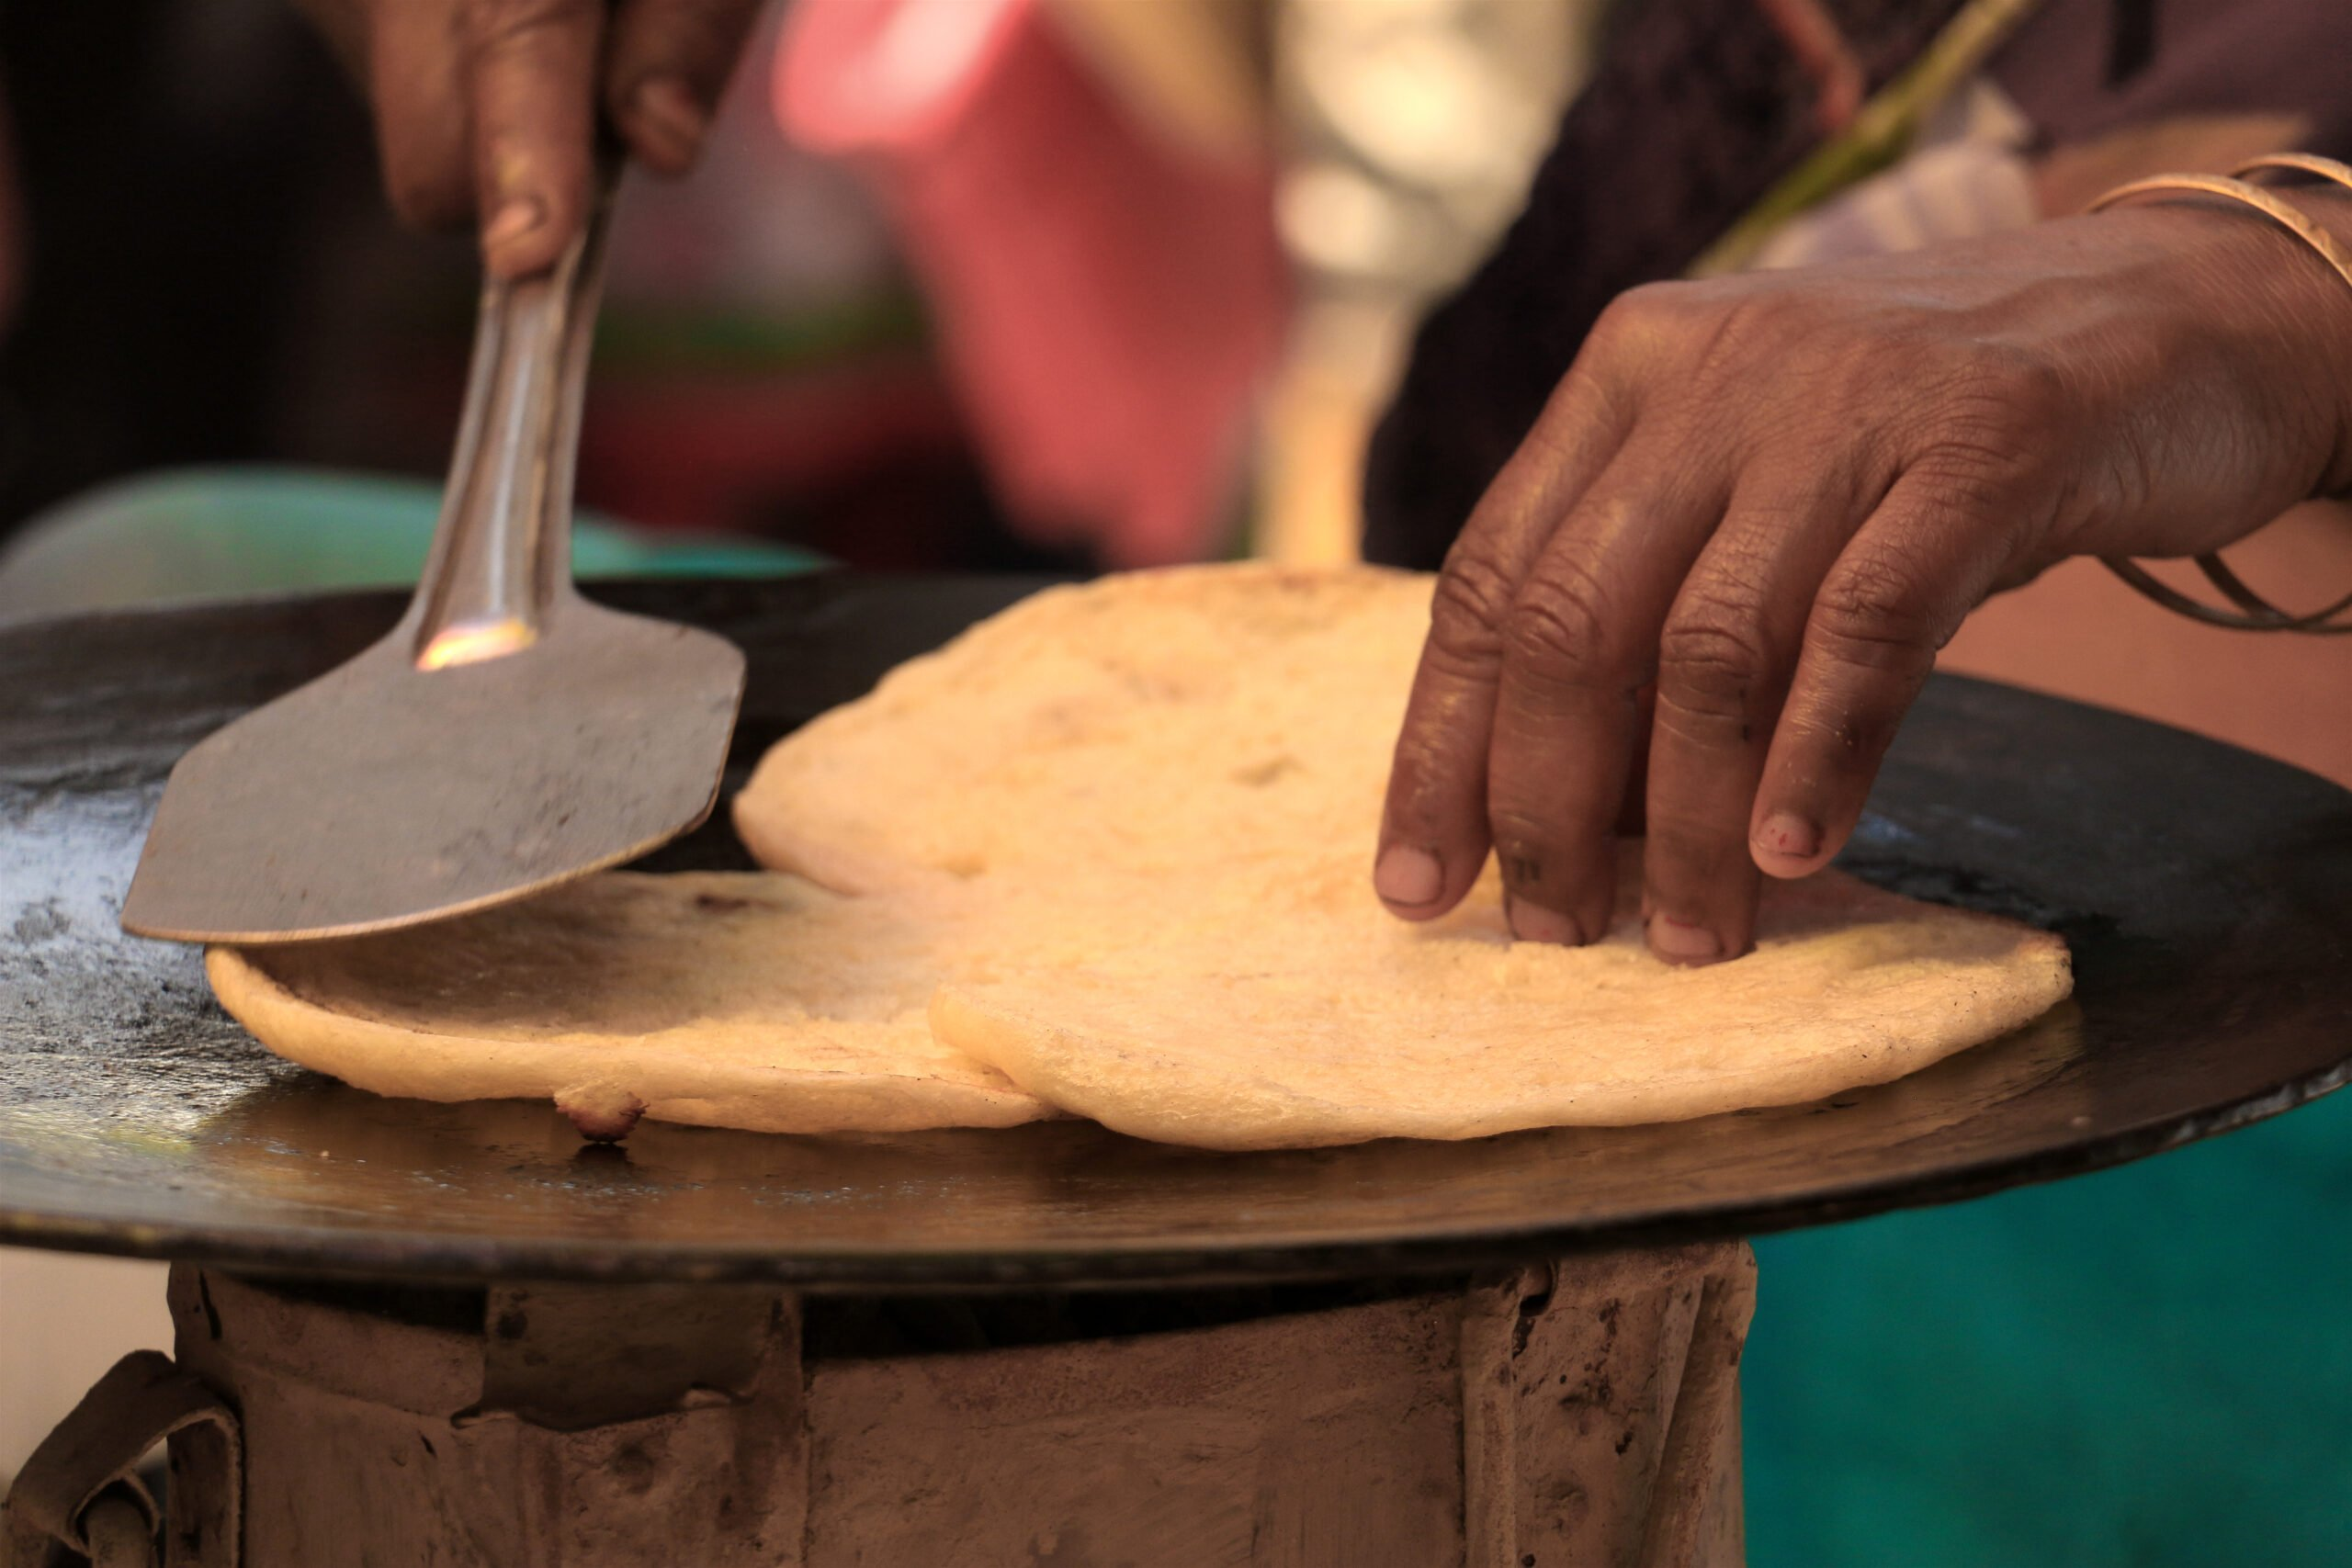 Discover Delhi Street Food Scene In Our Old Delhi Night Food Walk